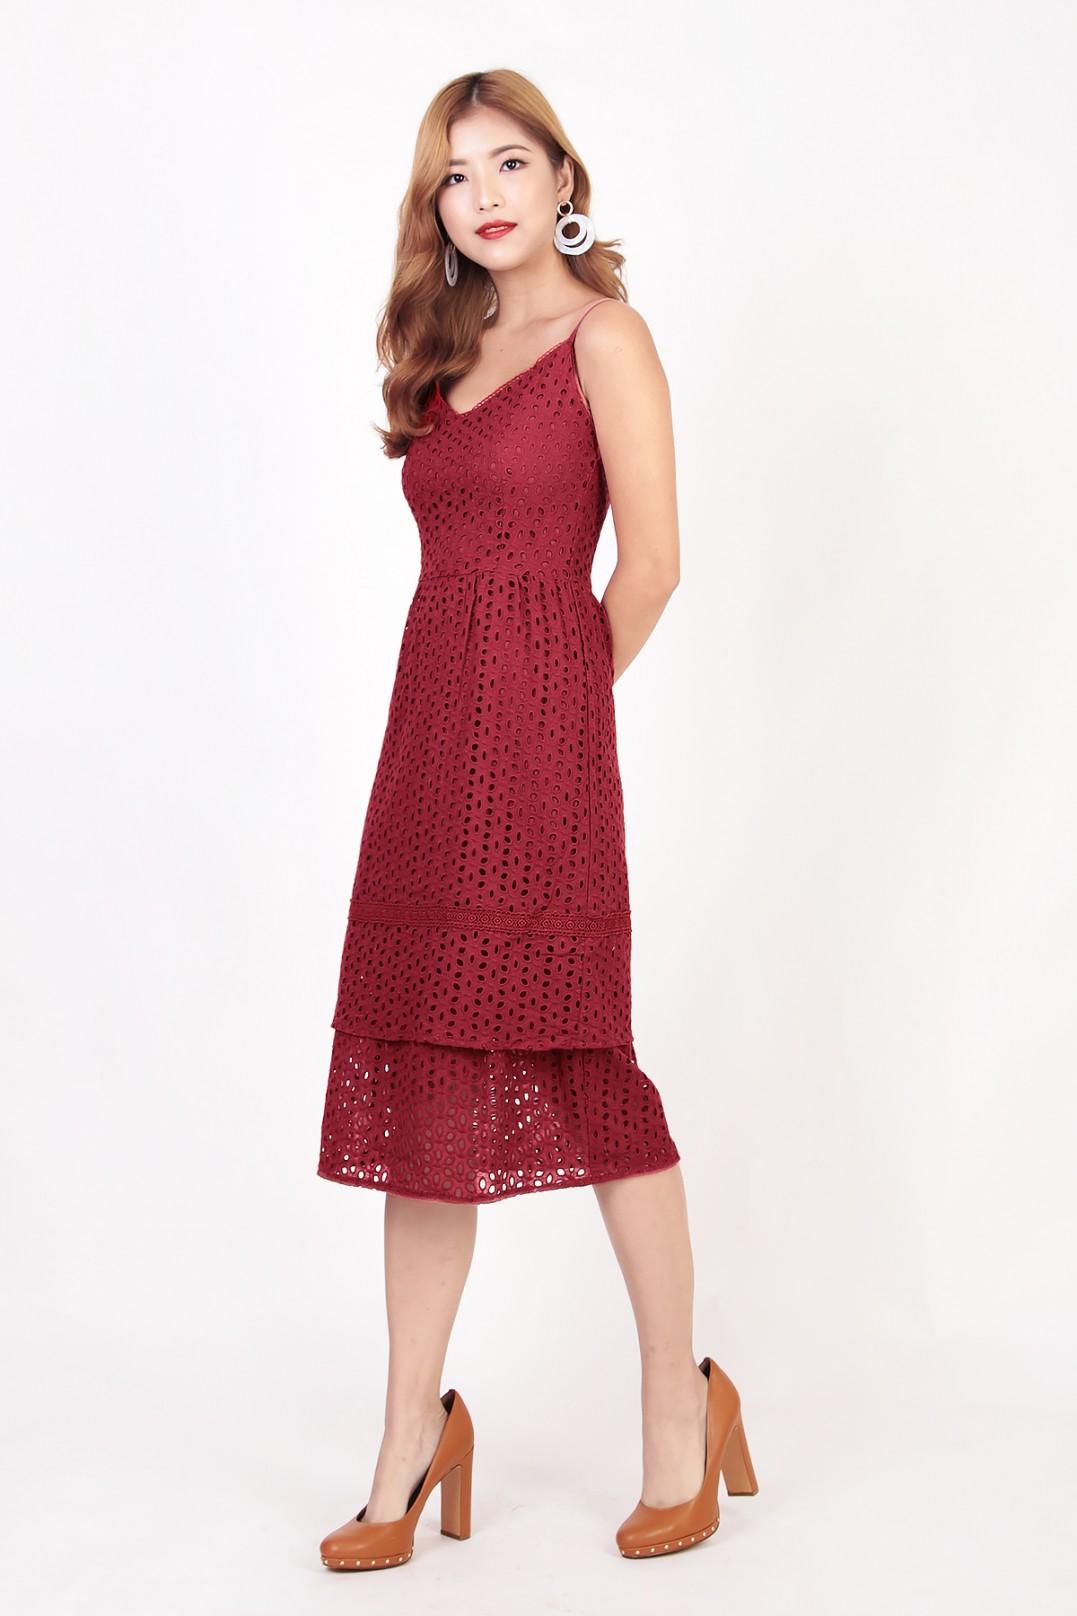 Breezy Eyelet Knit Long Nightgown by Dreams & Co.®| Plus